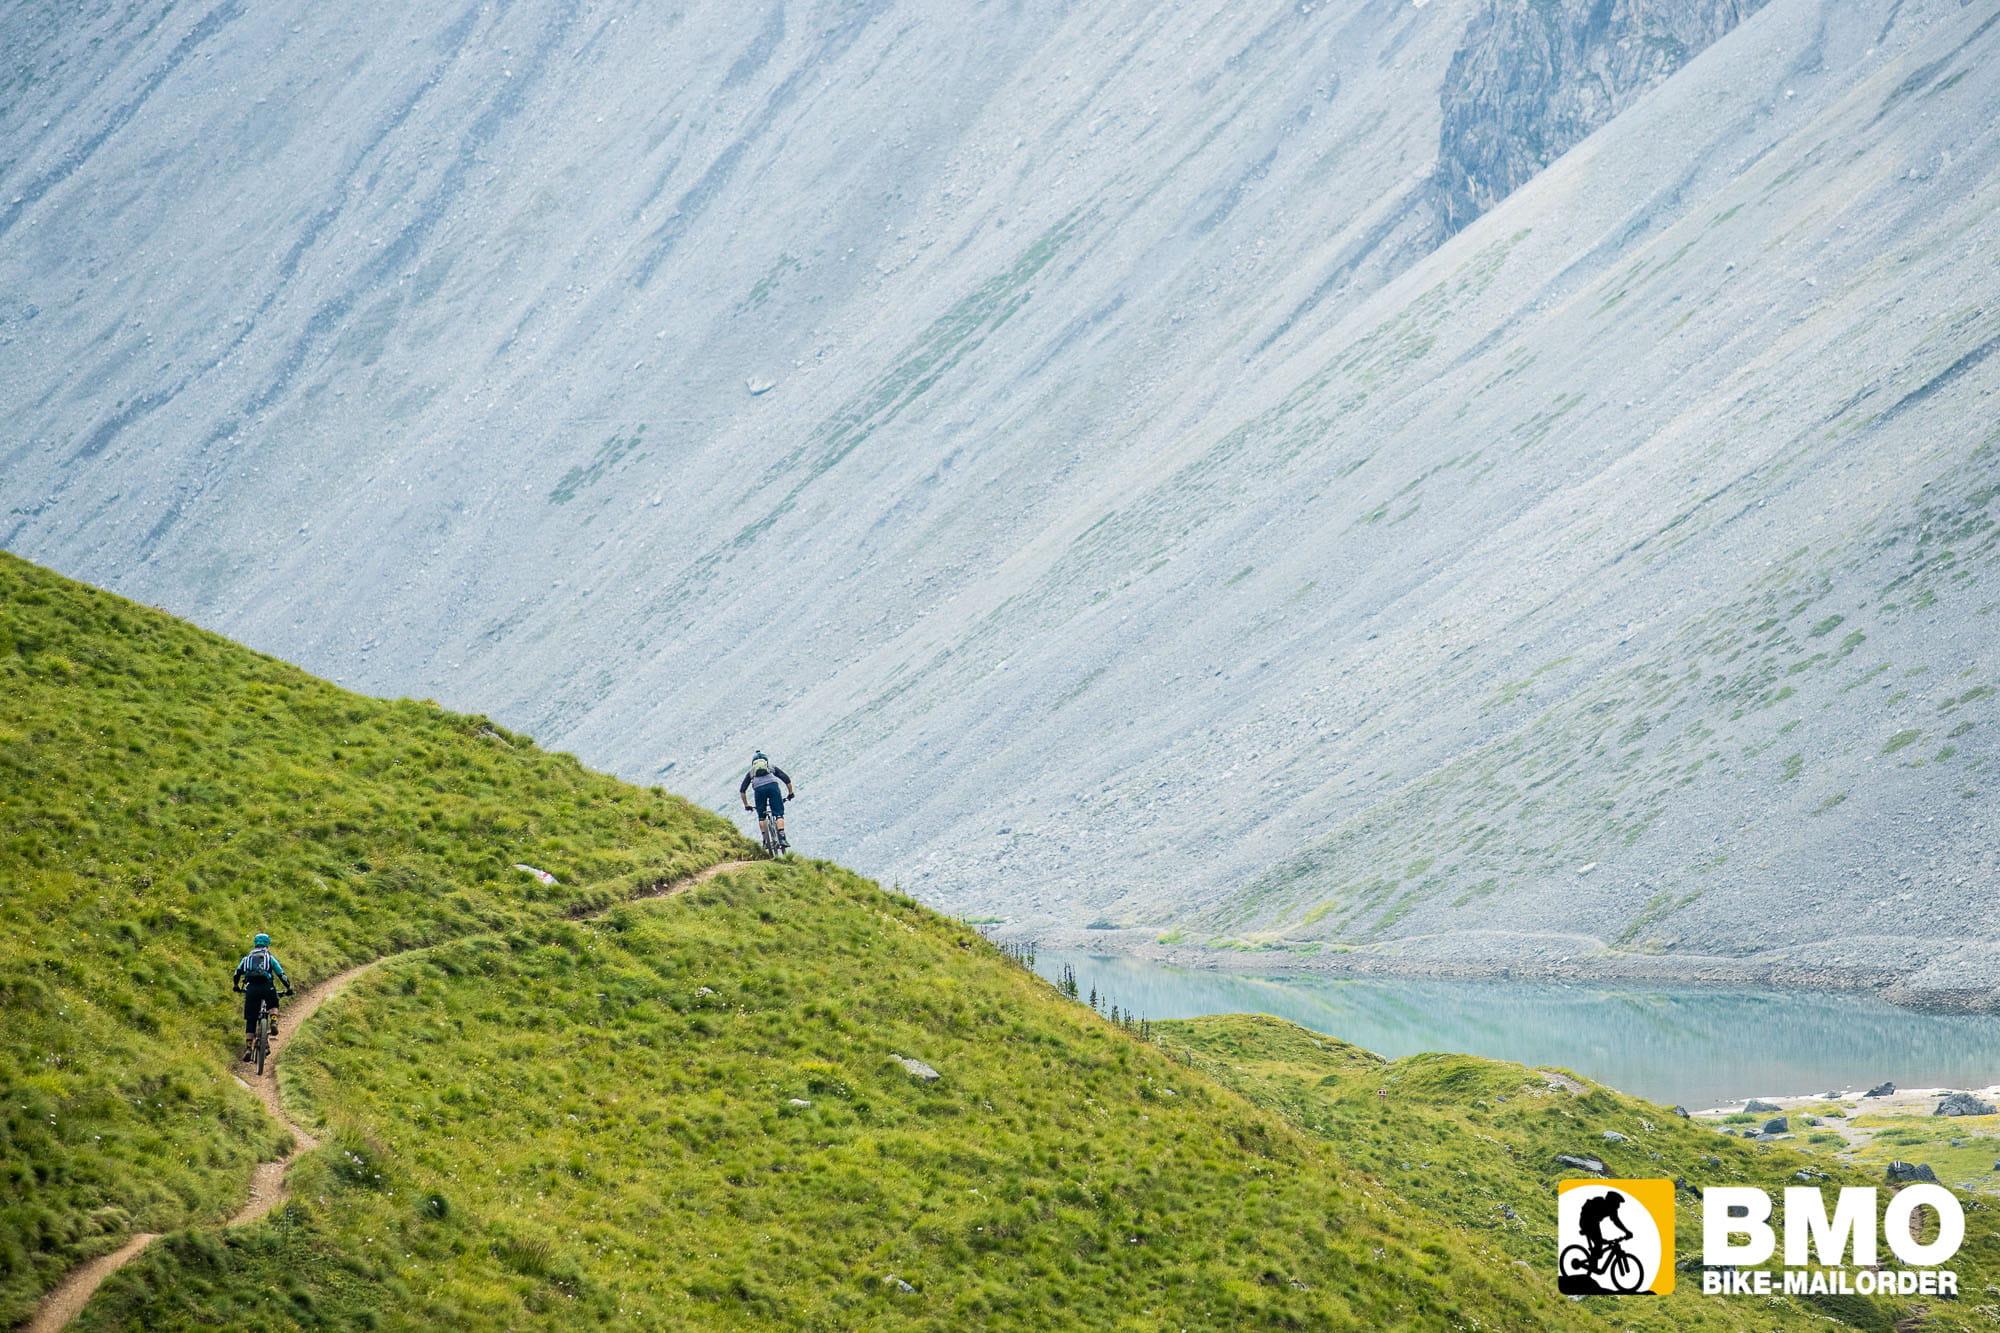 BMO-Bike-Mailorder-Lenzerheide-Home-of-Trails-4